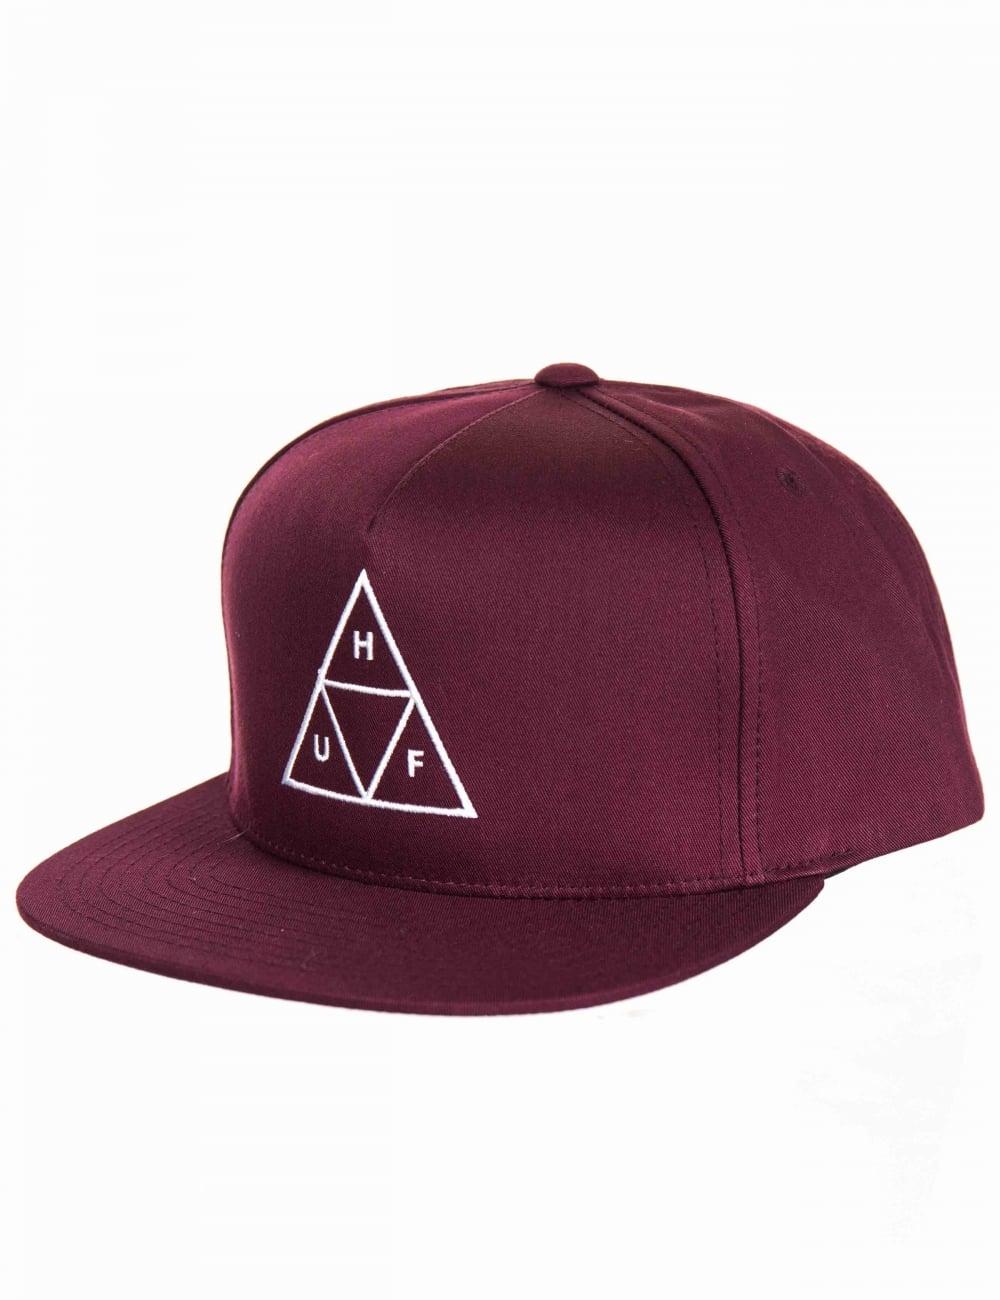 Huf Triple Triangle Snapback Hat - Wine - Accessories from Fat ... e33185a95f42